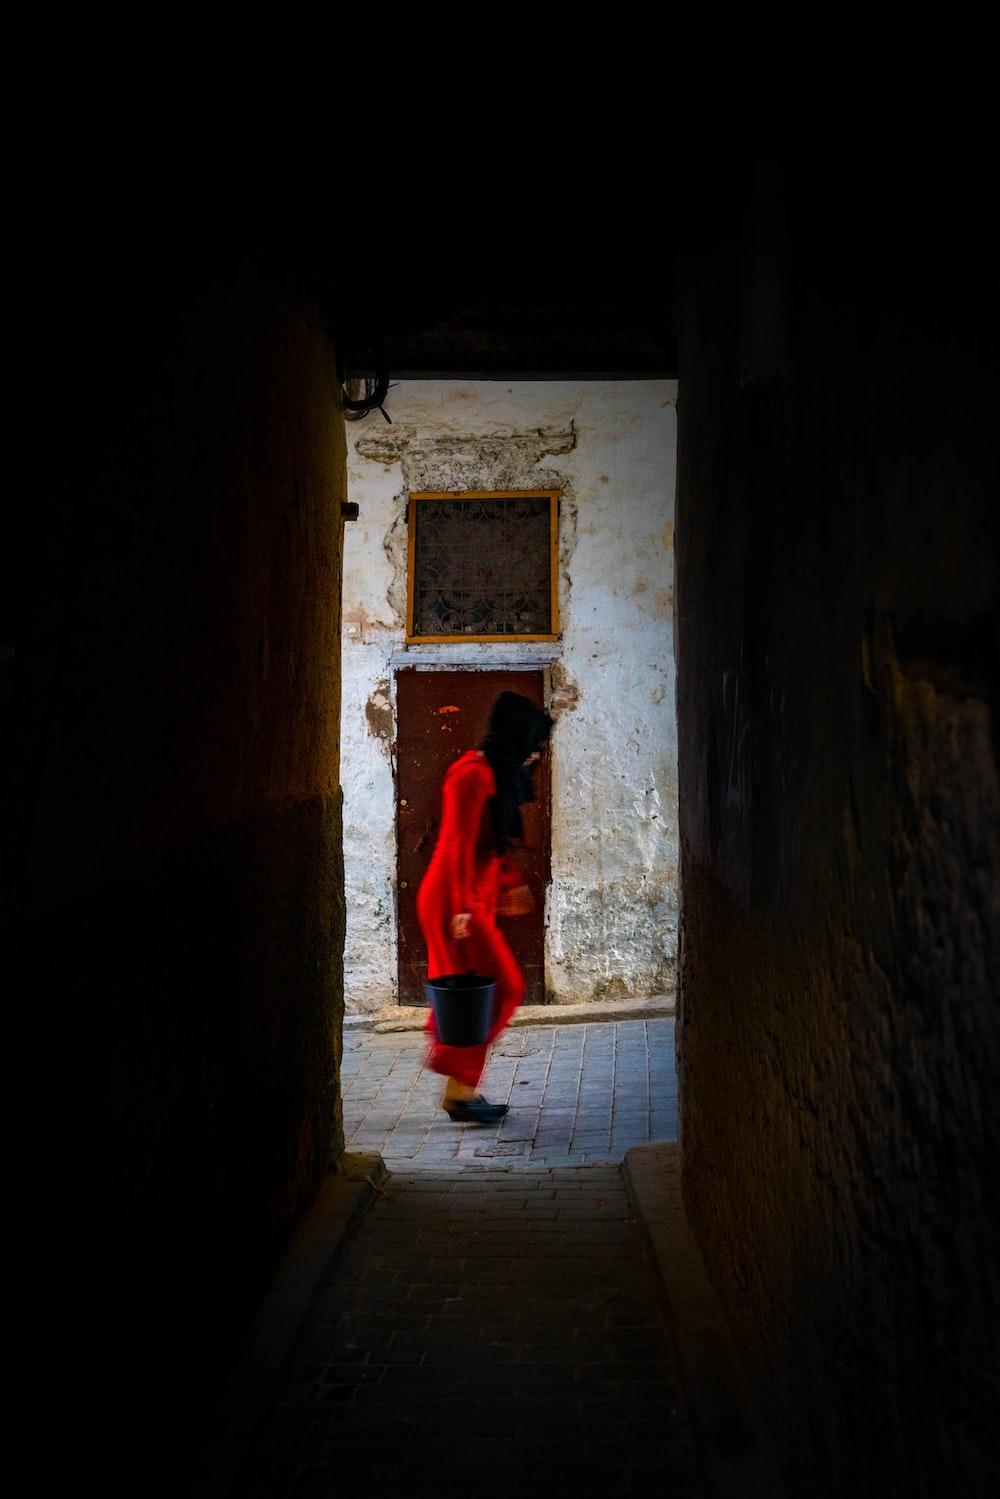 woman in red salwar kameez dress